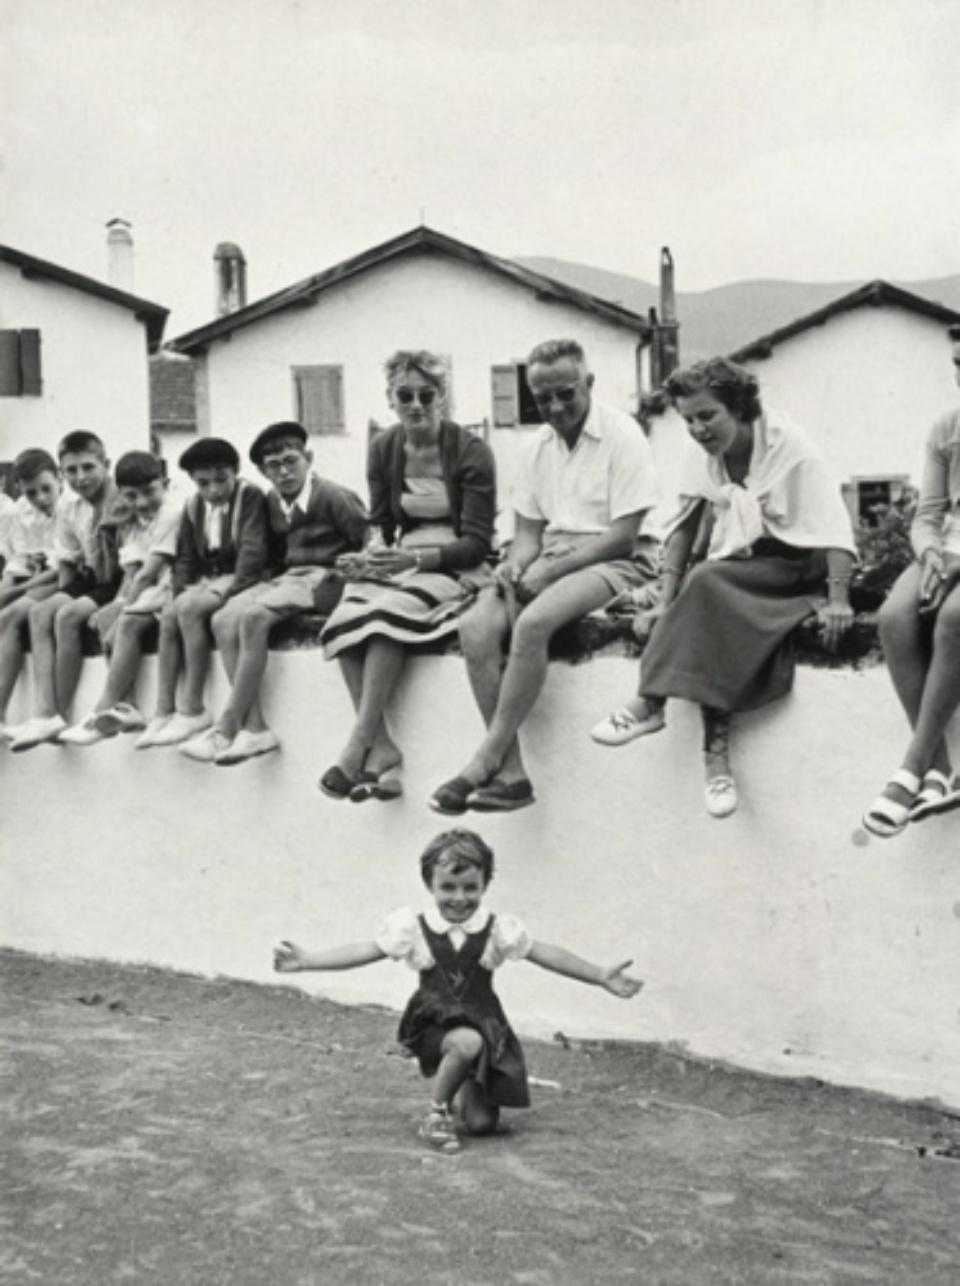 Robert Capa: Village Festival Basque Country, France, 1951